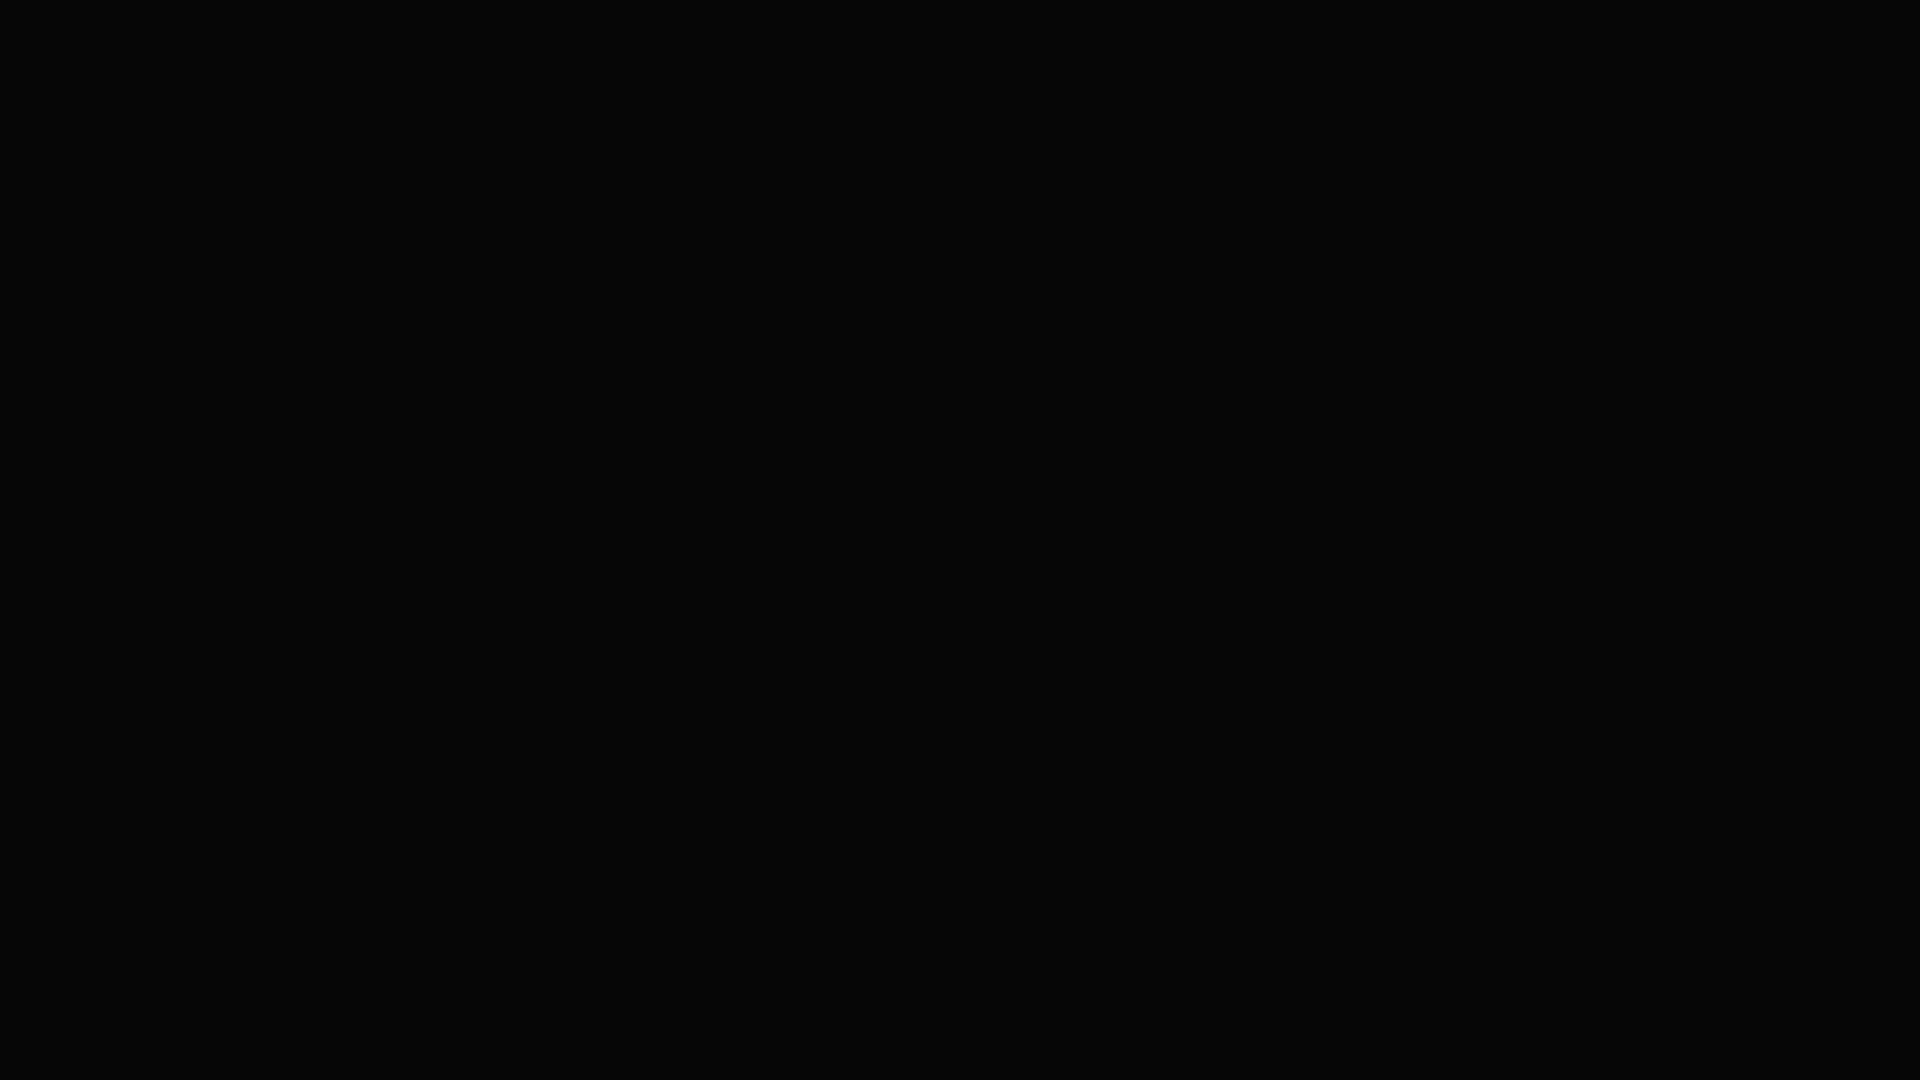 DMC - Devil May Cry 5